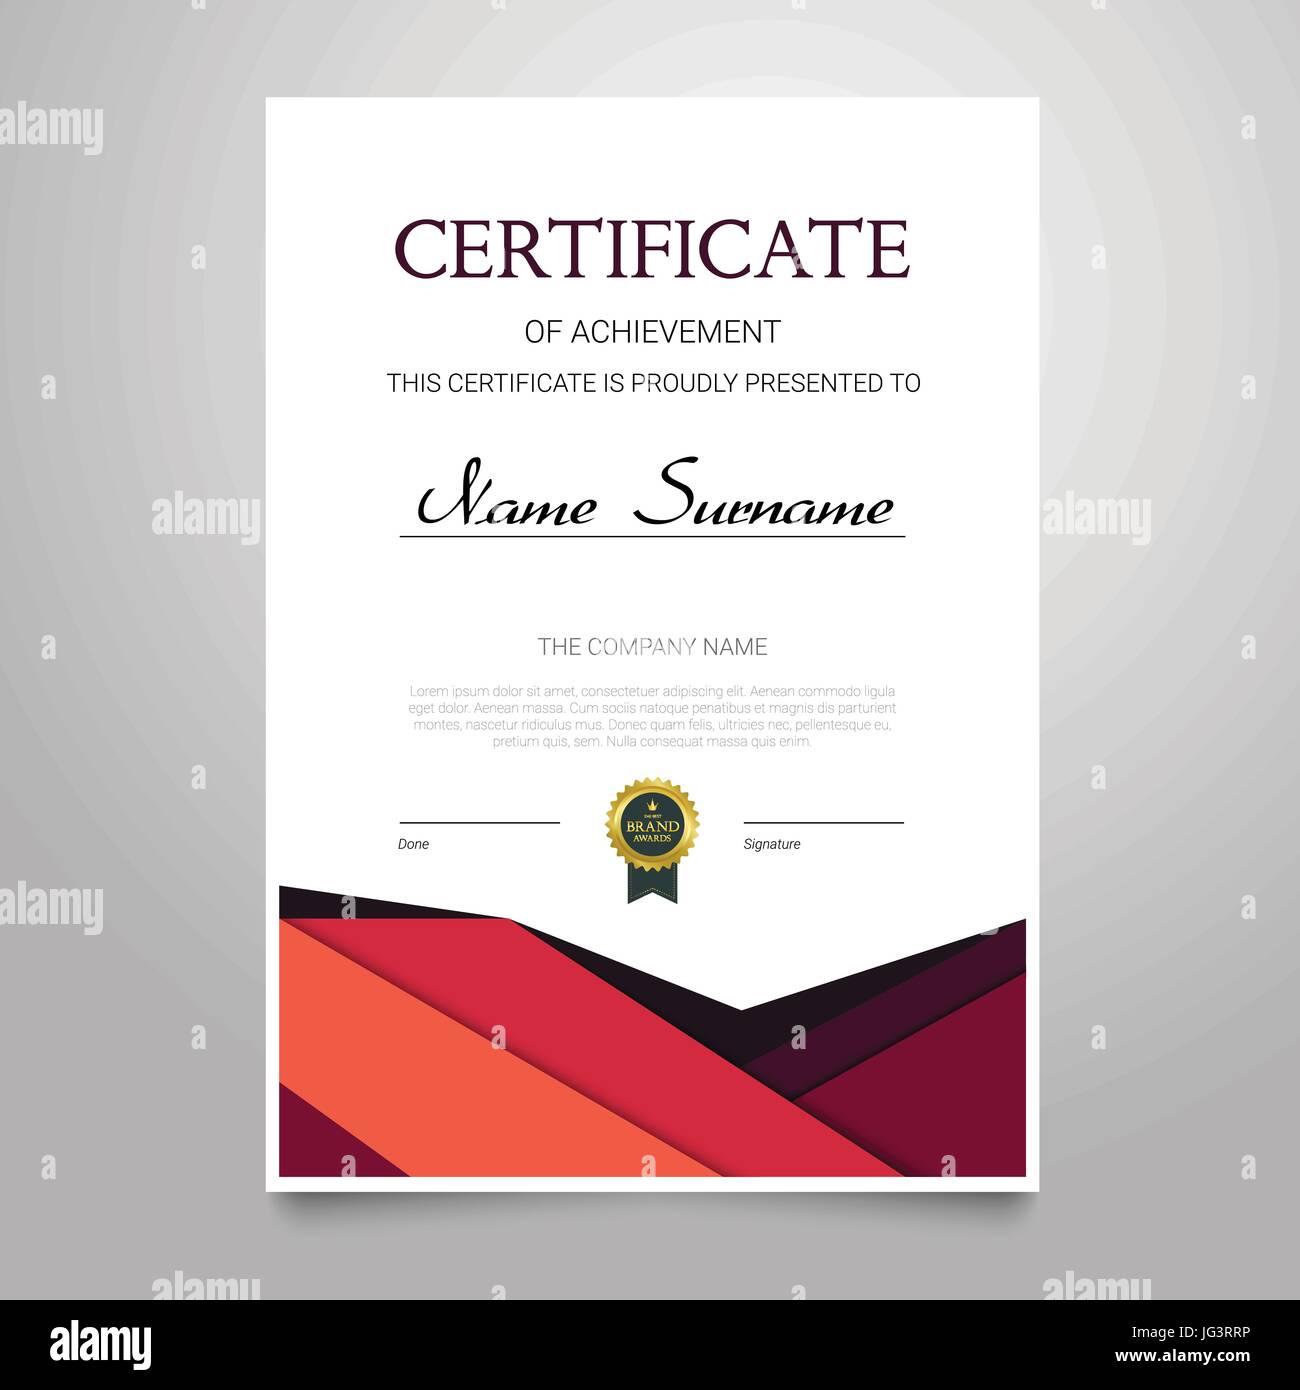 Zertifikat-Vorlage - moderne vertikale elegante Vektor Dokument mit ...